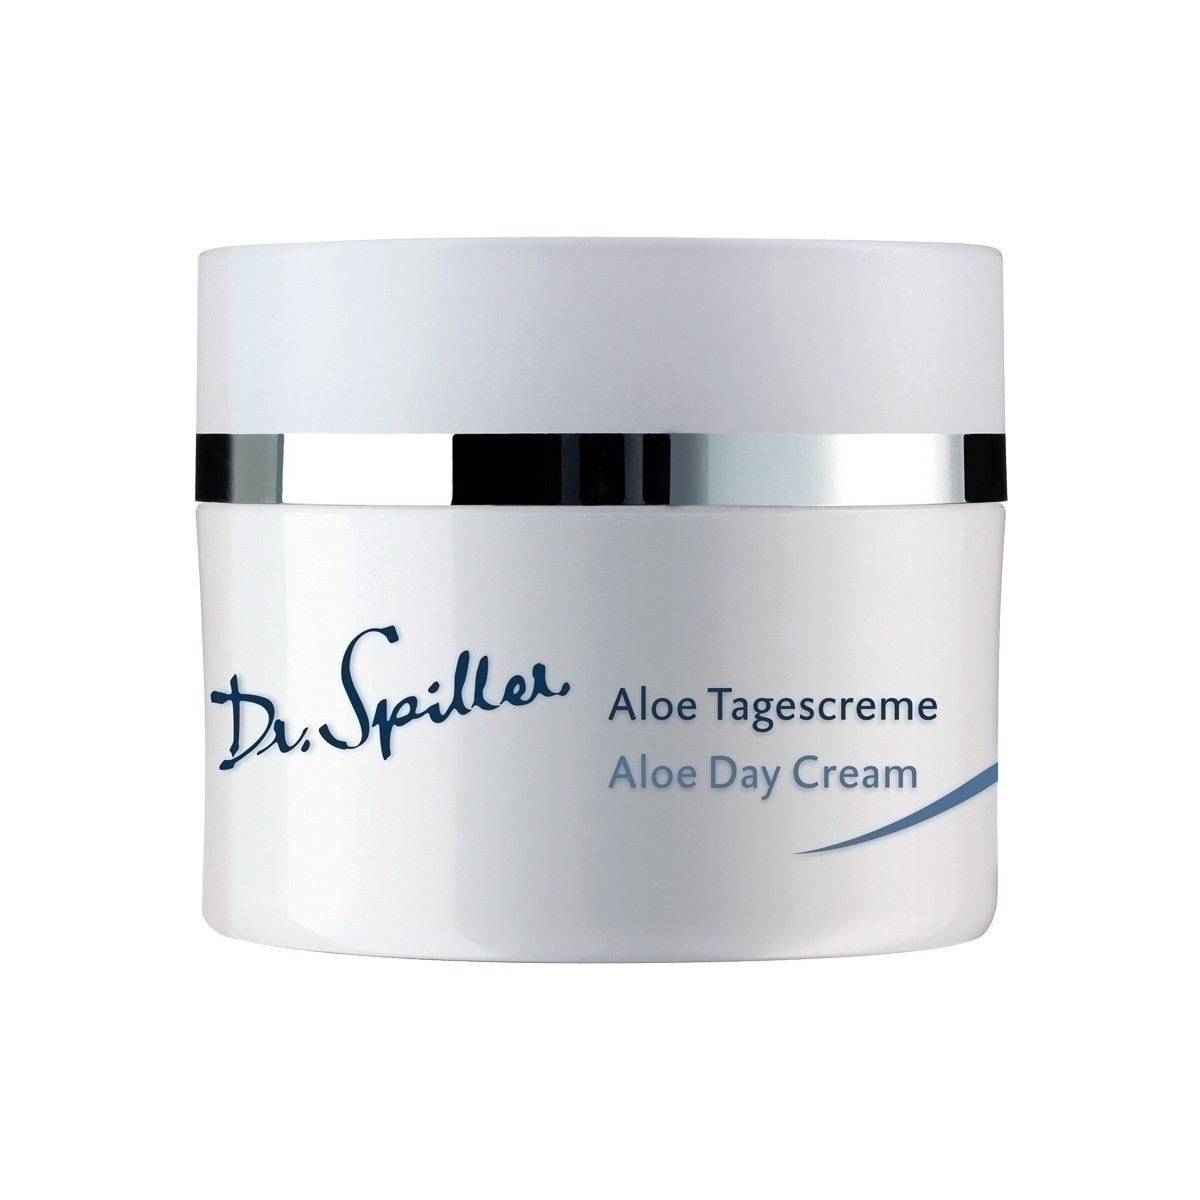 Afbeelding van Dr. Spiller Aloe Tagescreme Base Line Basisverzorging jonge huid